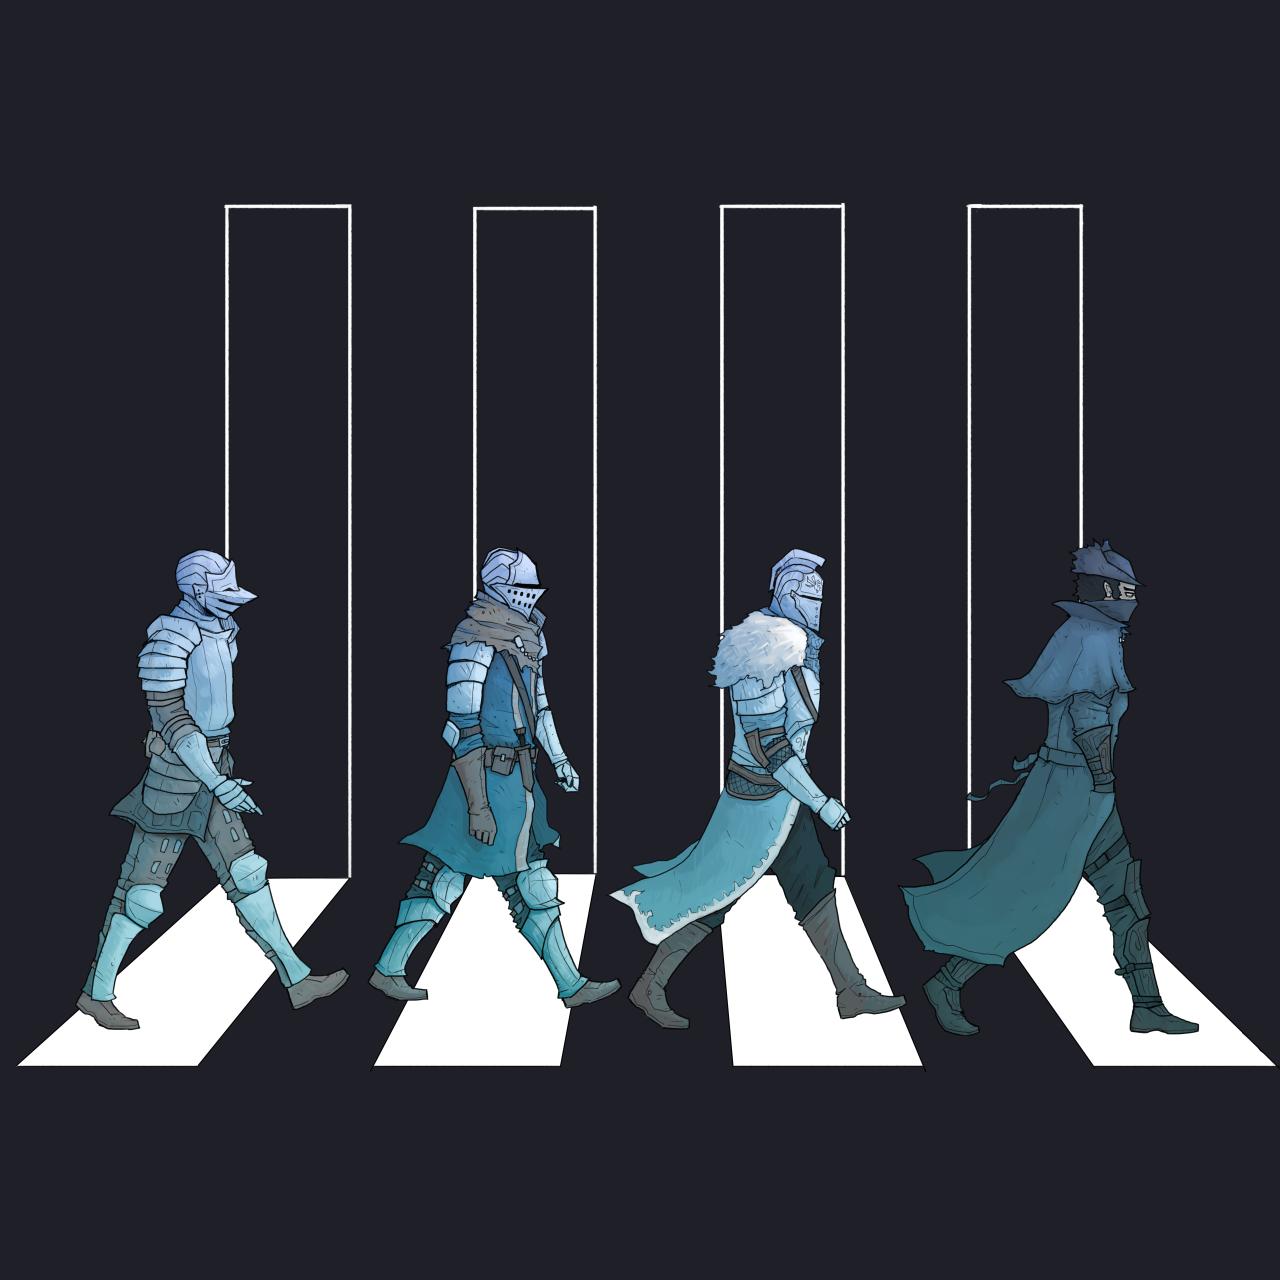 Shirt design games - A Particularly Soulful Blog Chuylol Souls Road Shirt Design Parody Of